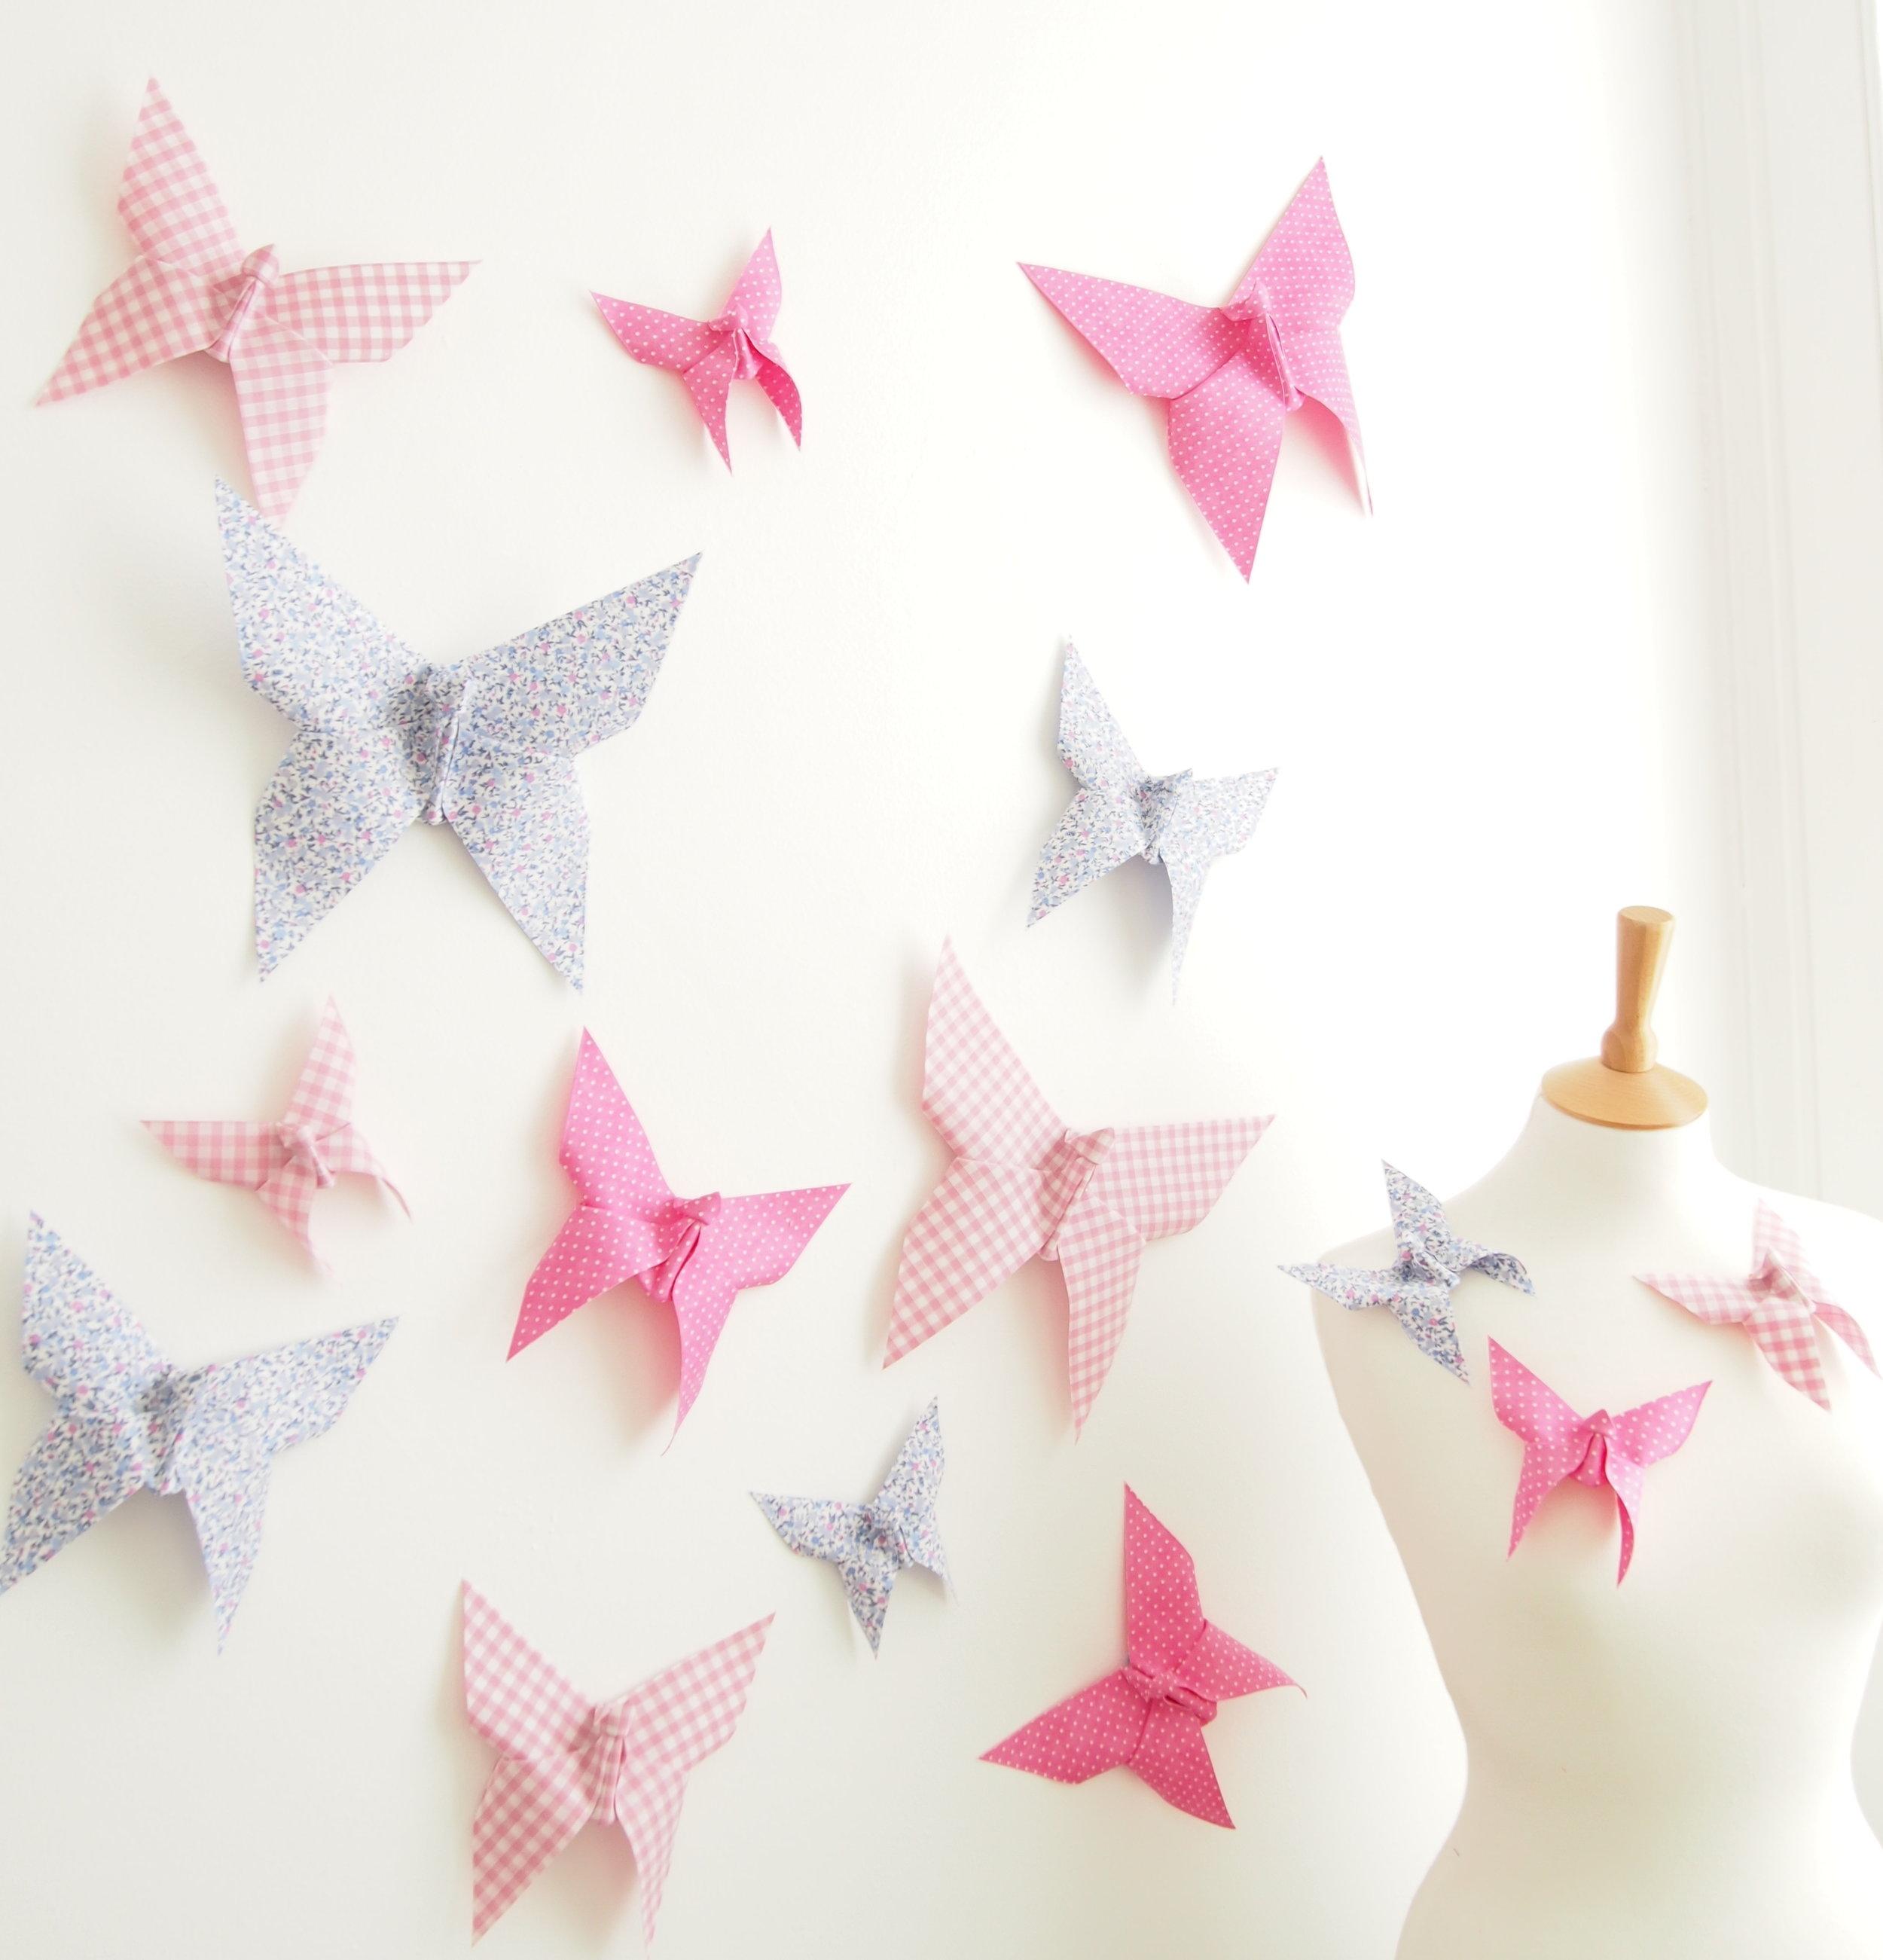 Origami Butterflies for Wedding Nursery Decor